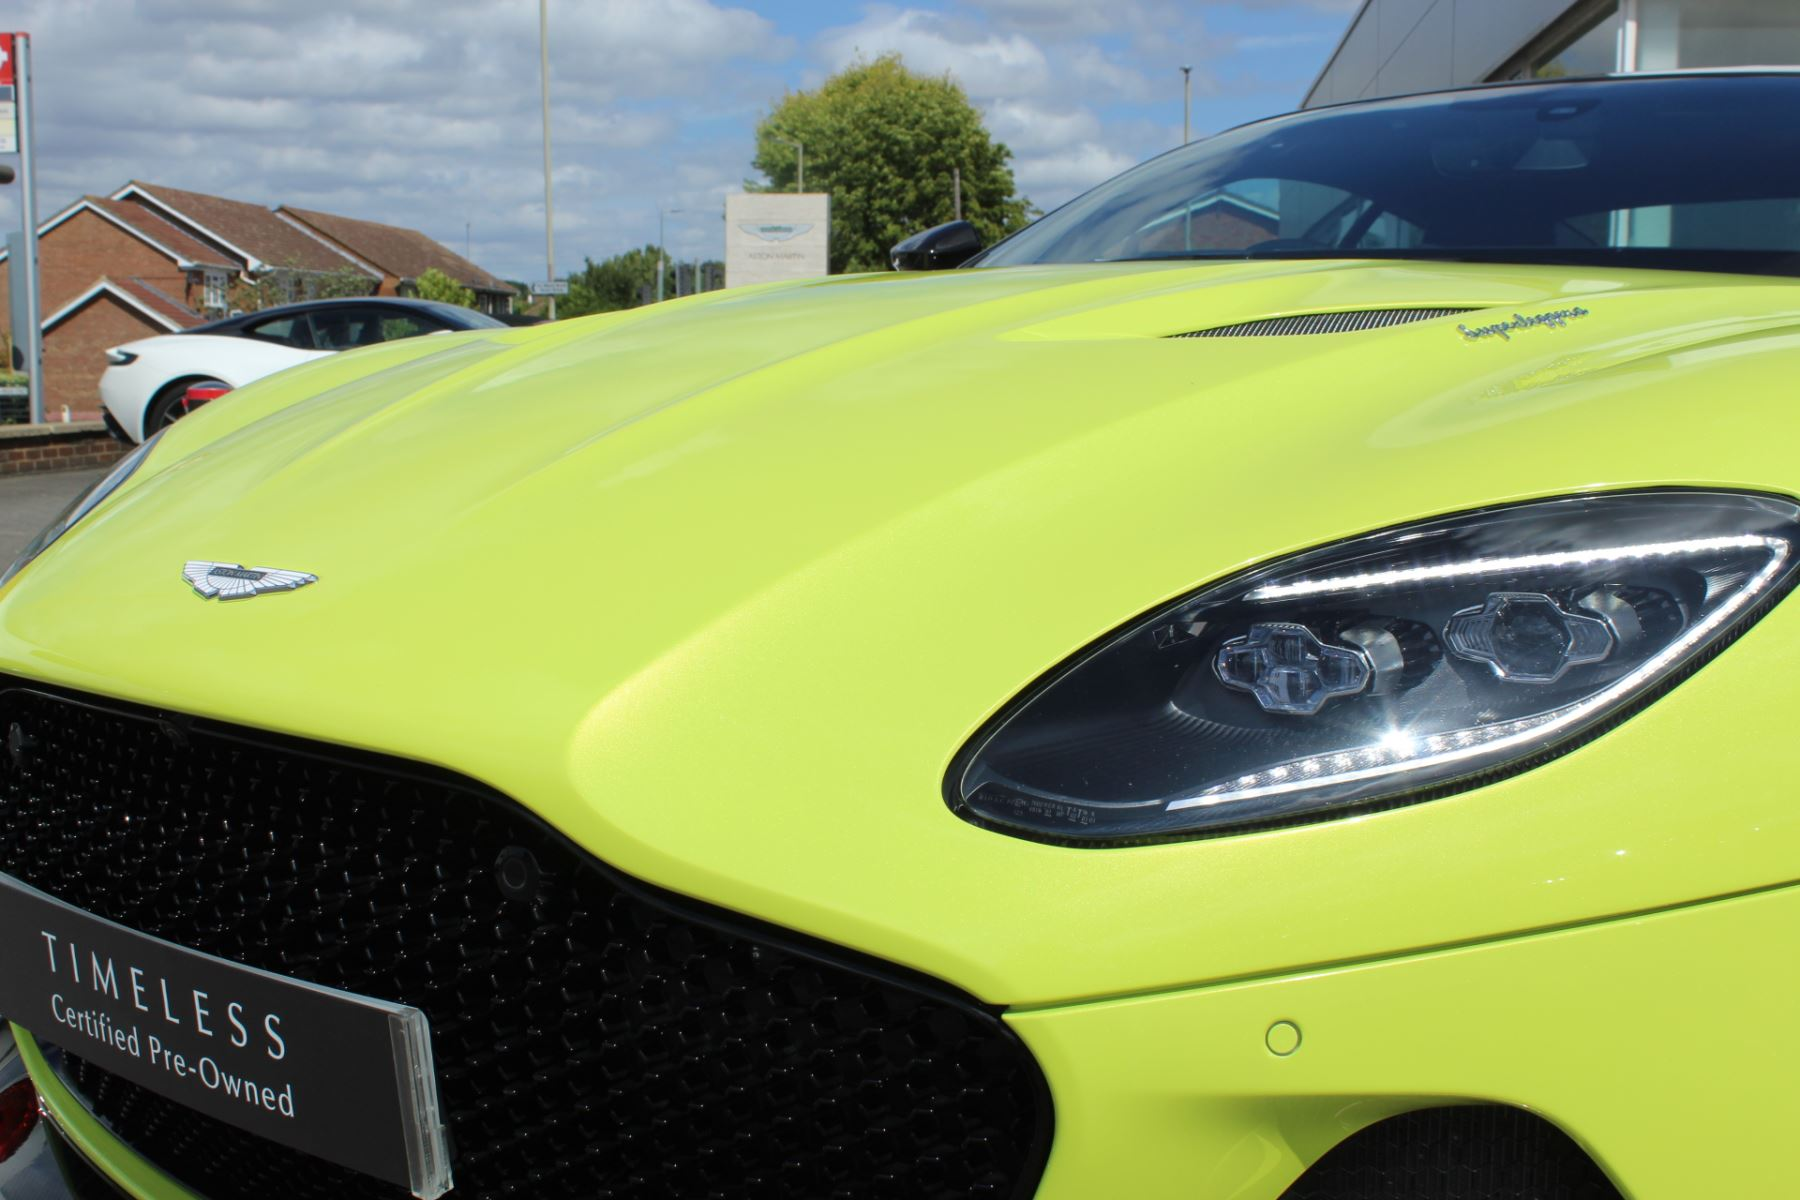 Aston Martin DBS V12 Superleggera 2dr Touchtronic image 5